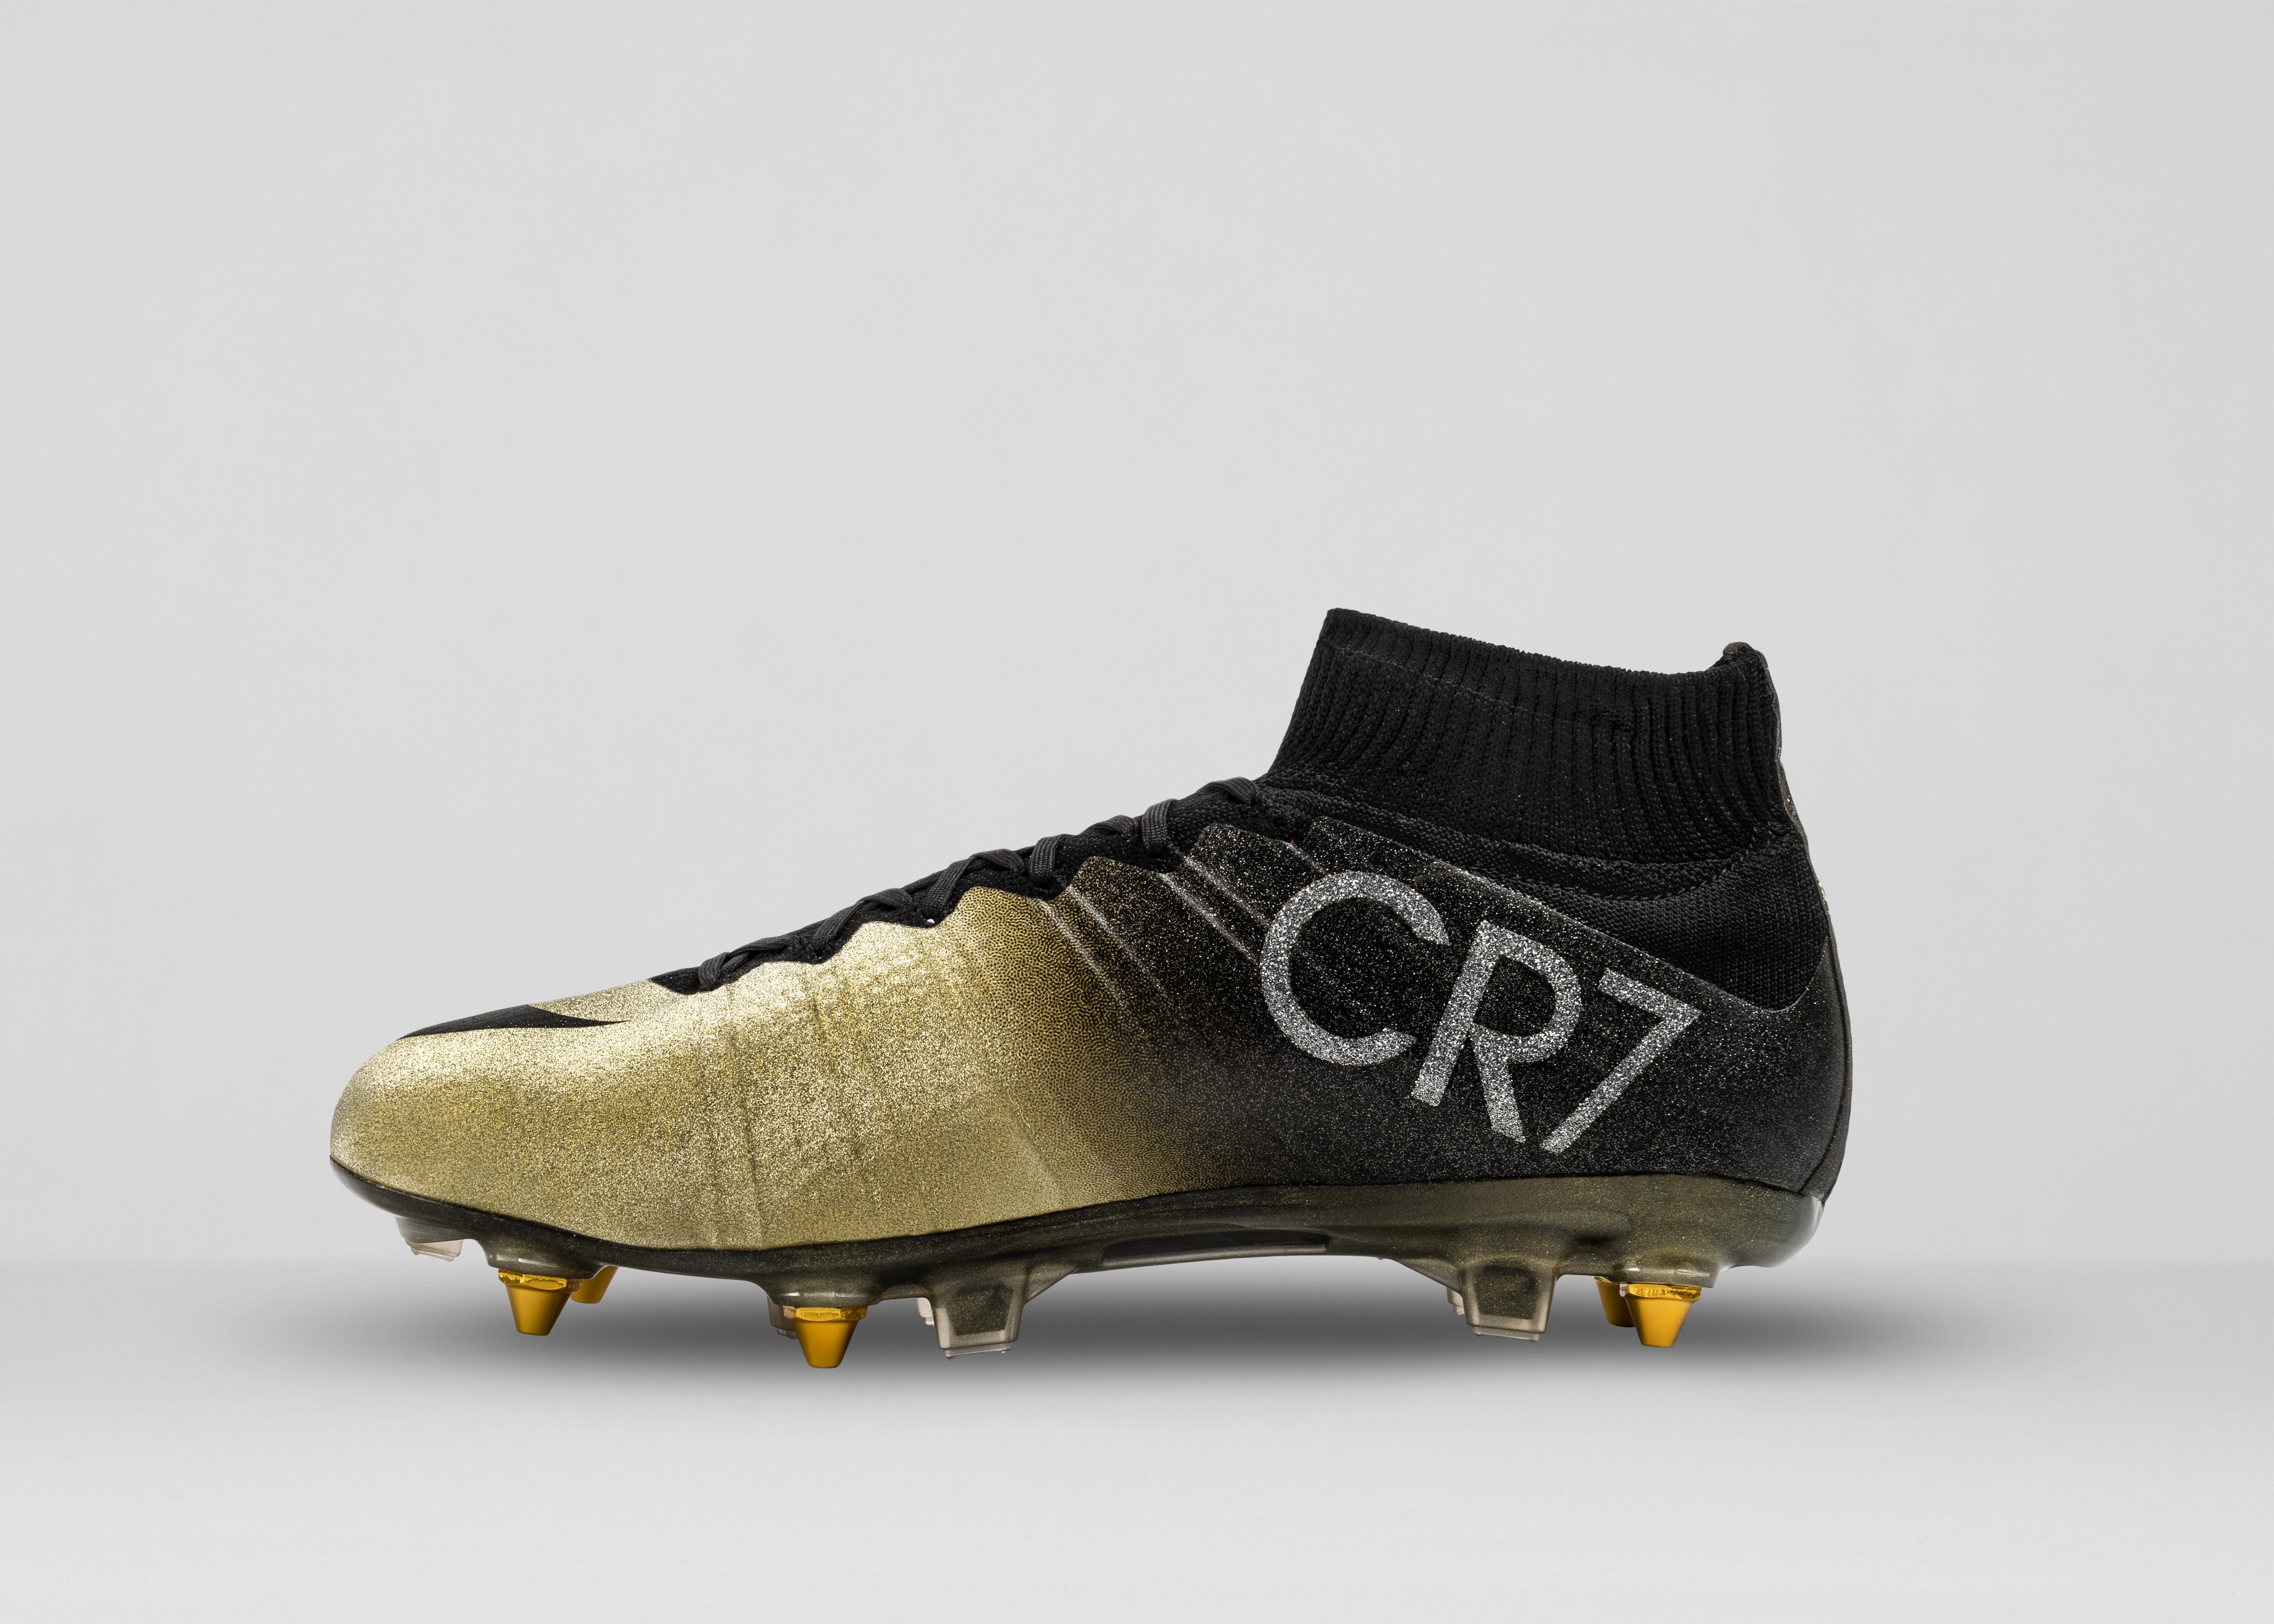 cr7 2015 scarpe